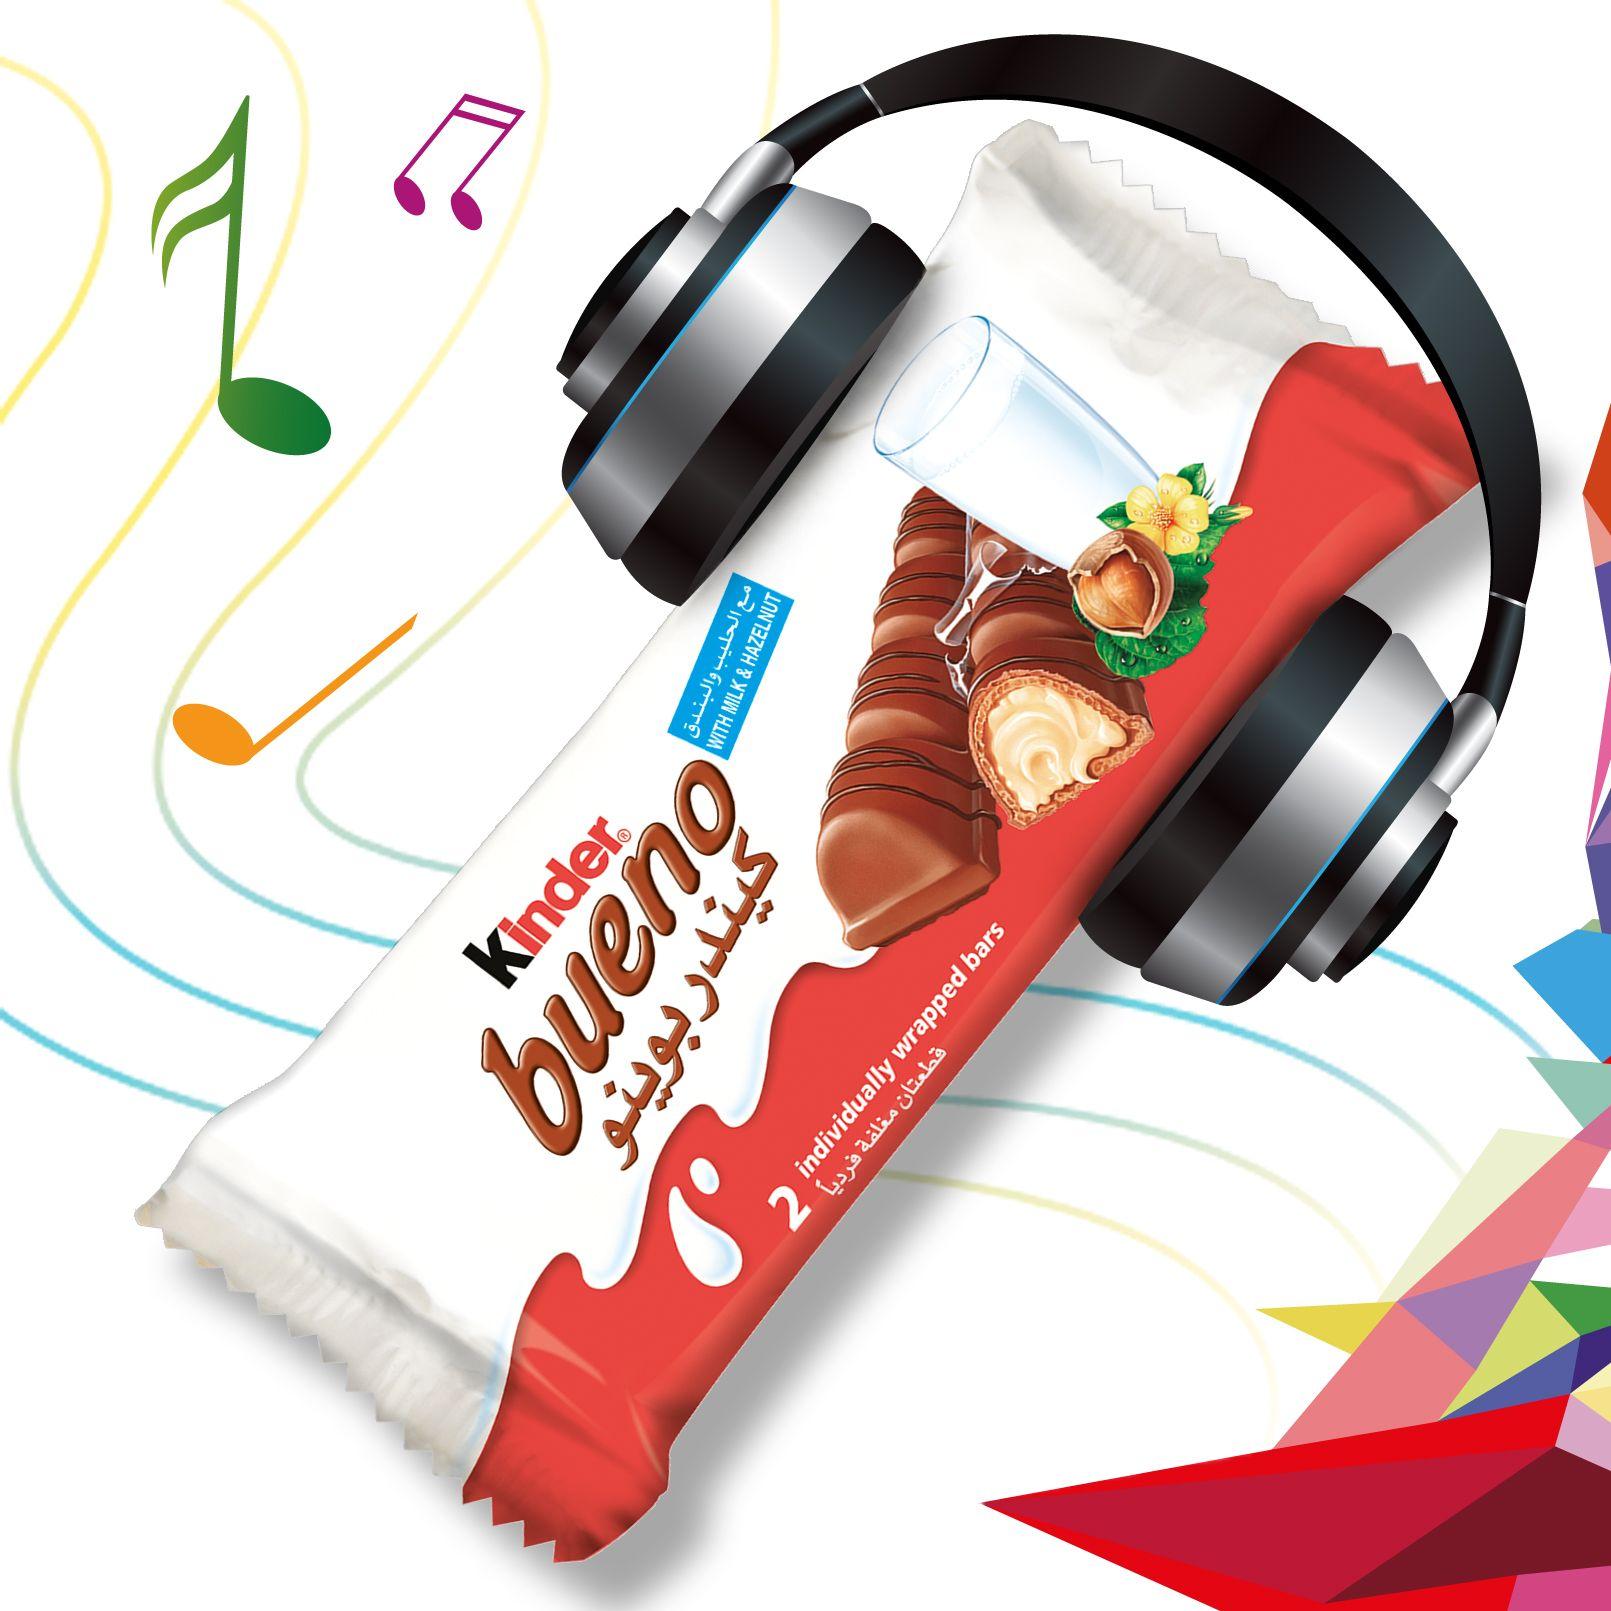 Guys Tune In And Get Ready For A Cool Kinder Bueno Mix أجمل الميكسات مع كيندر بوينو ابقوا معنا لمعرفة المزيد Kinder Bueno Te Kind Bars Cool Stuff Kinder